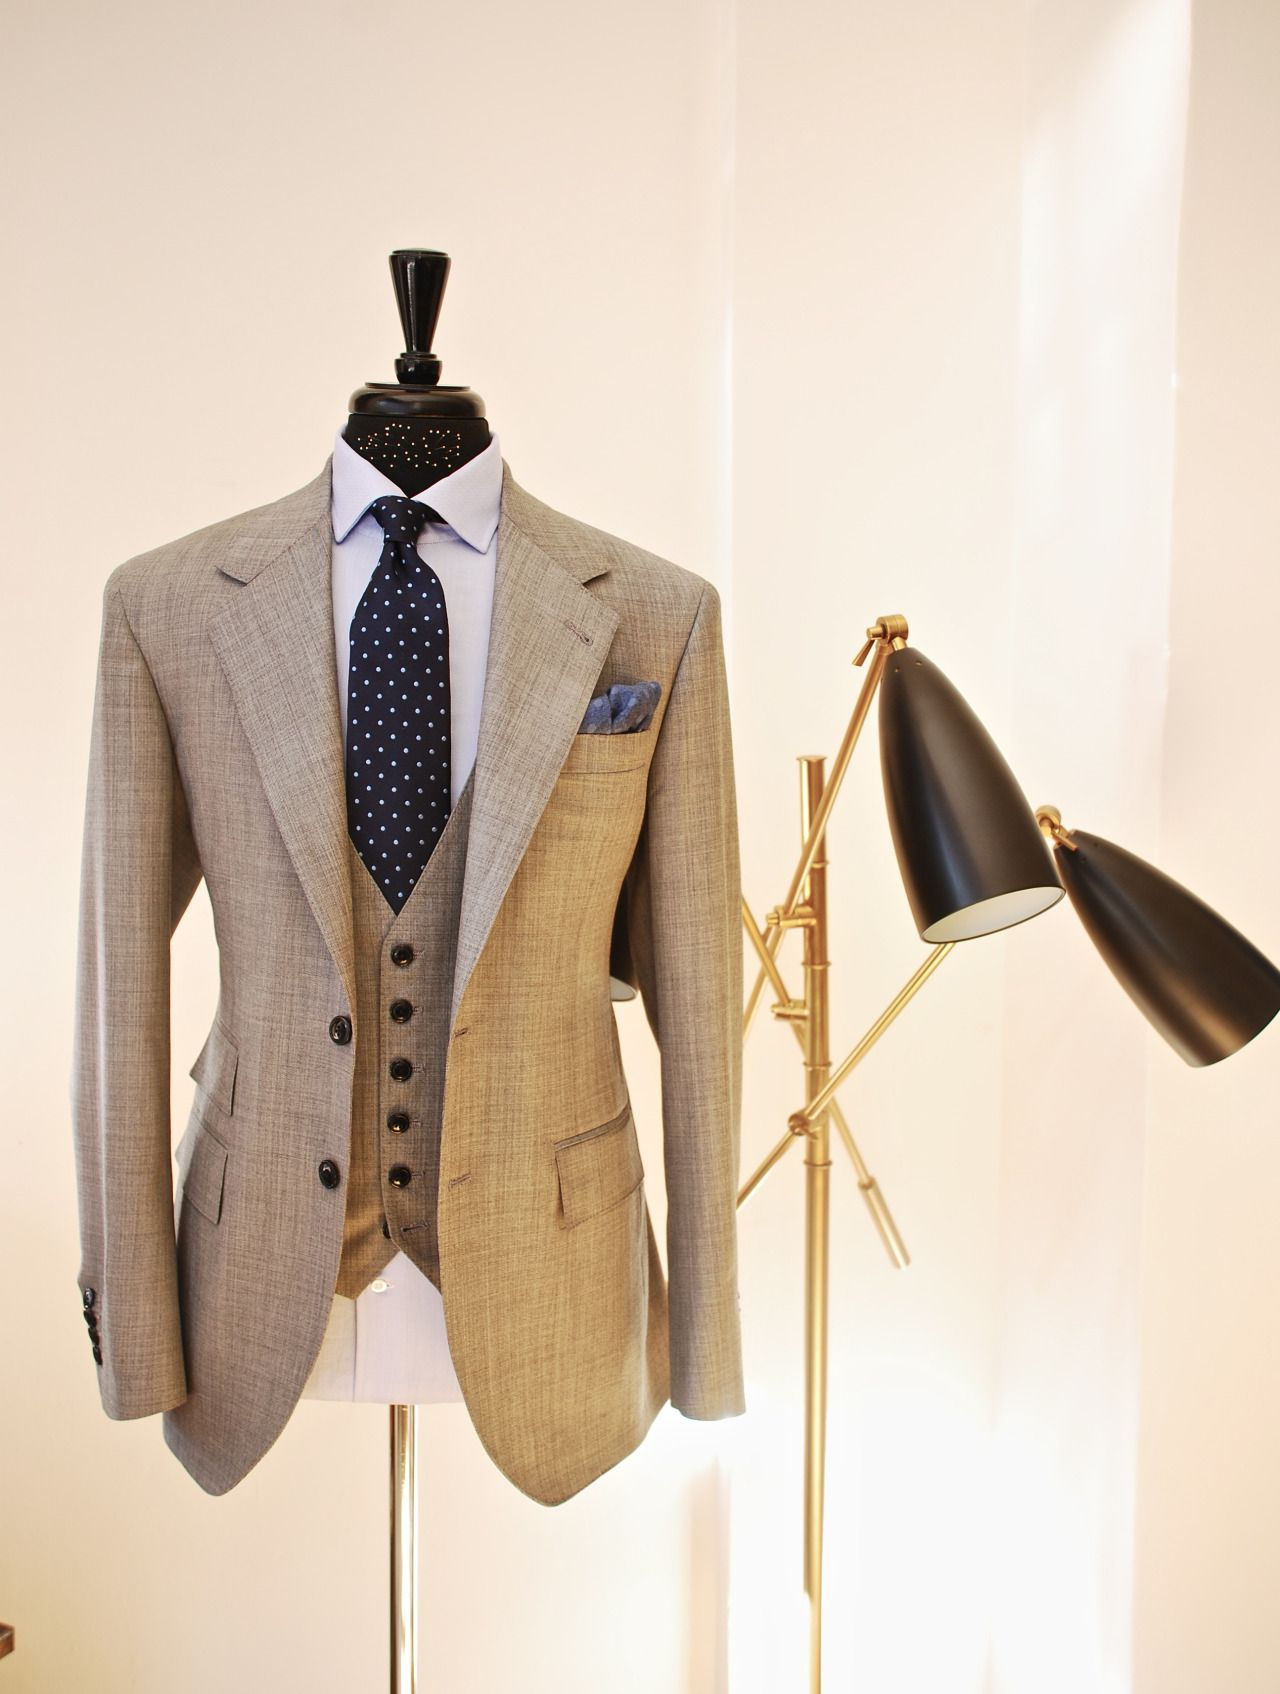 Sprezzatura-Eleganza | fatos | Pinterest | Suit men ...